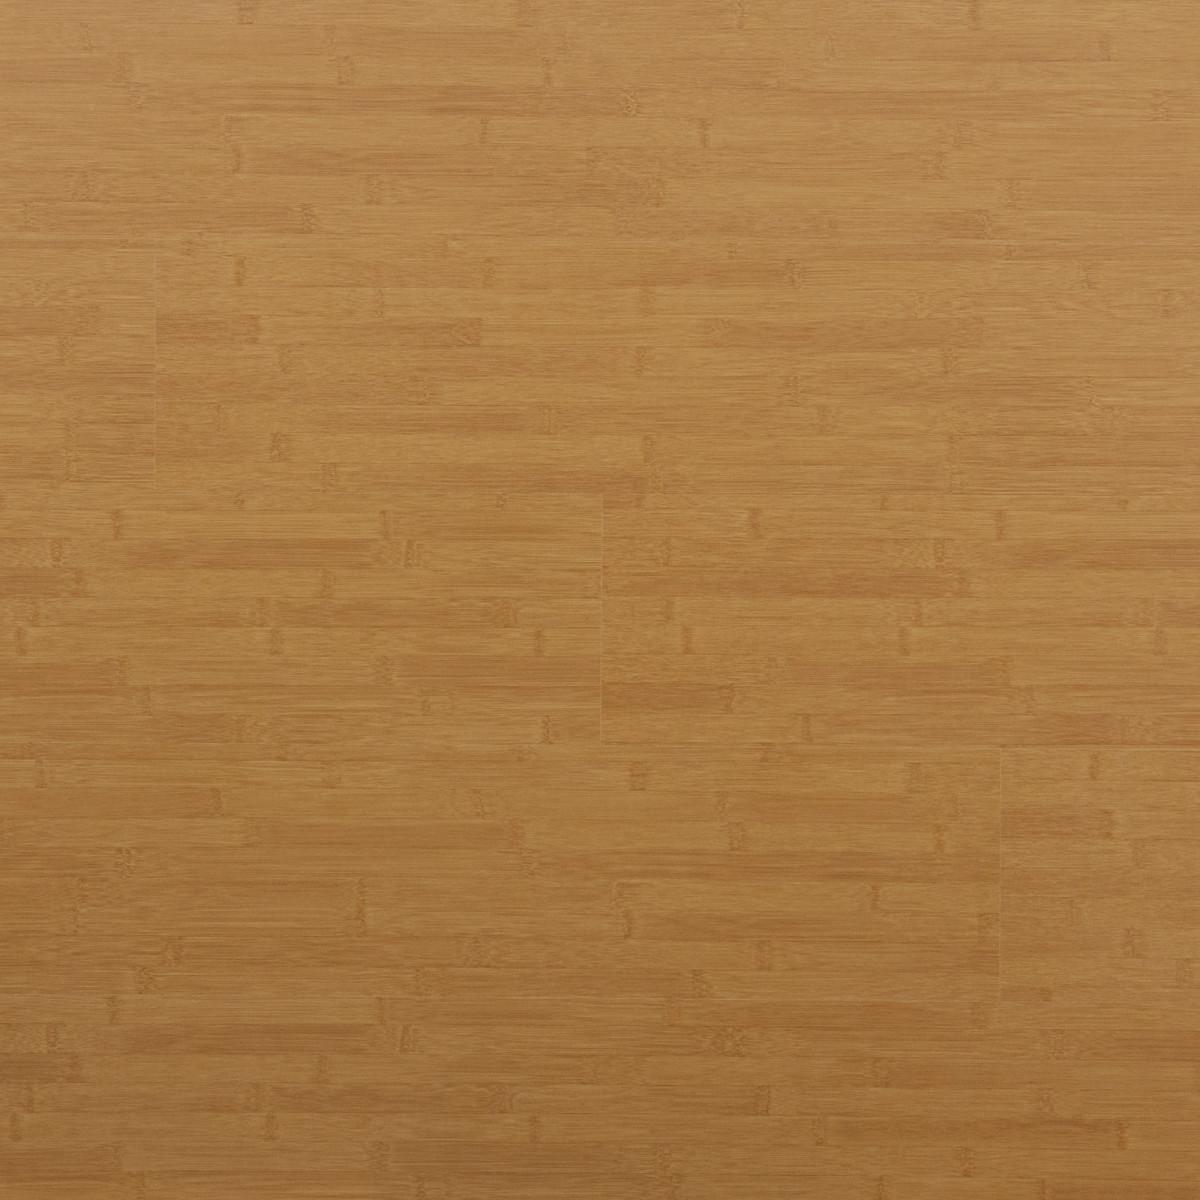 Ламинат Бамбук светлый 31 класс толщина 6 мм 2.663 м² цвет бежевый